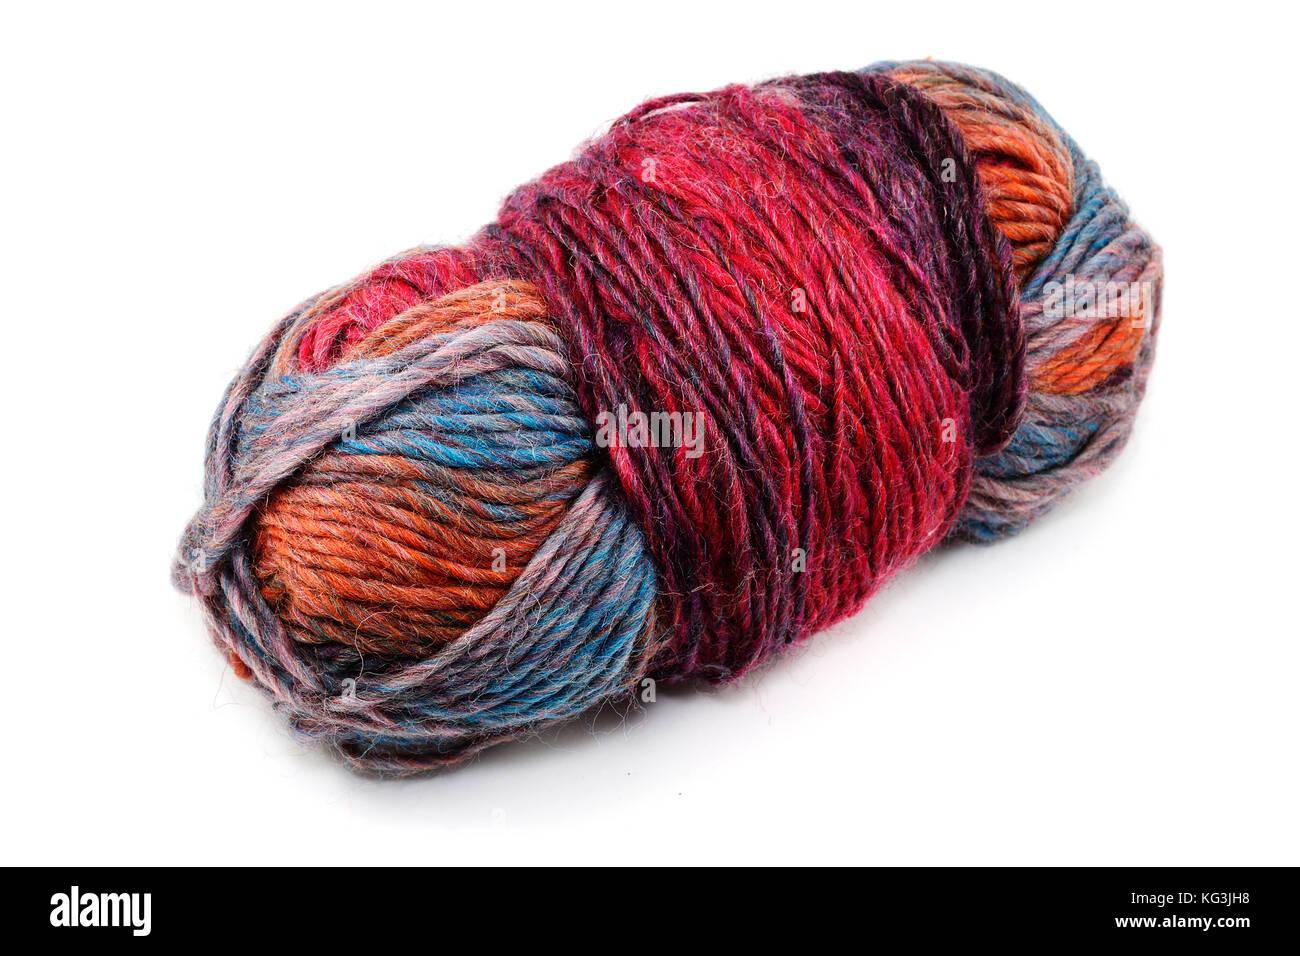 varicoloured ball of wool on white background - Stock Image